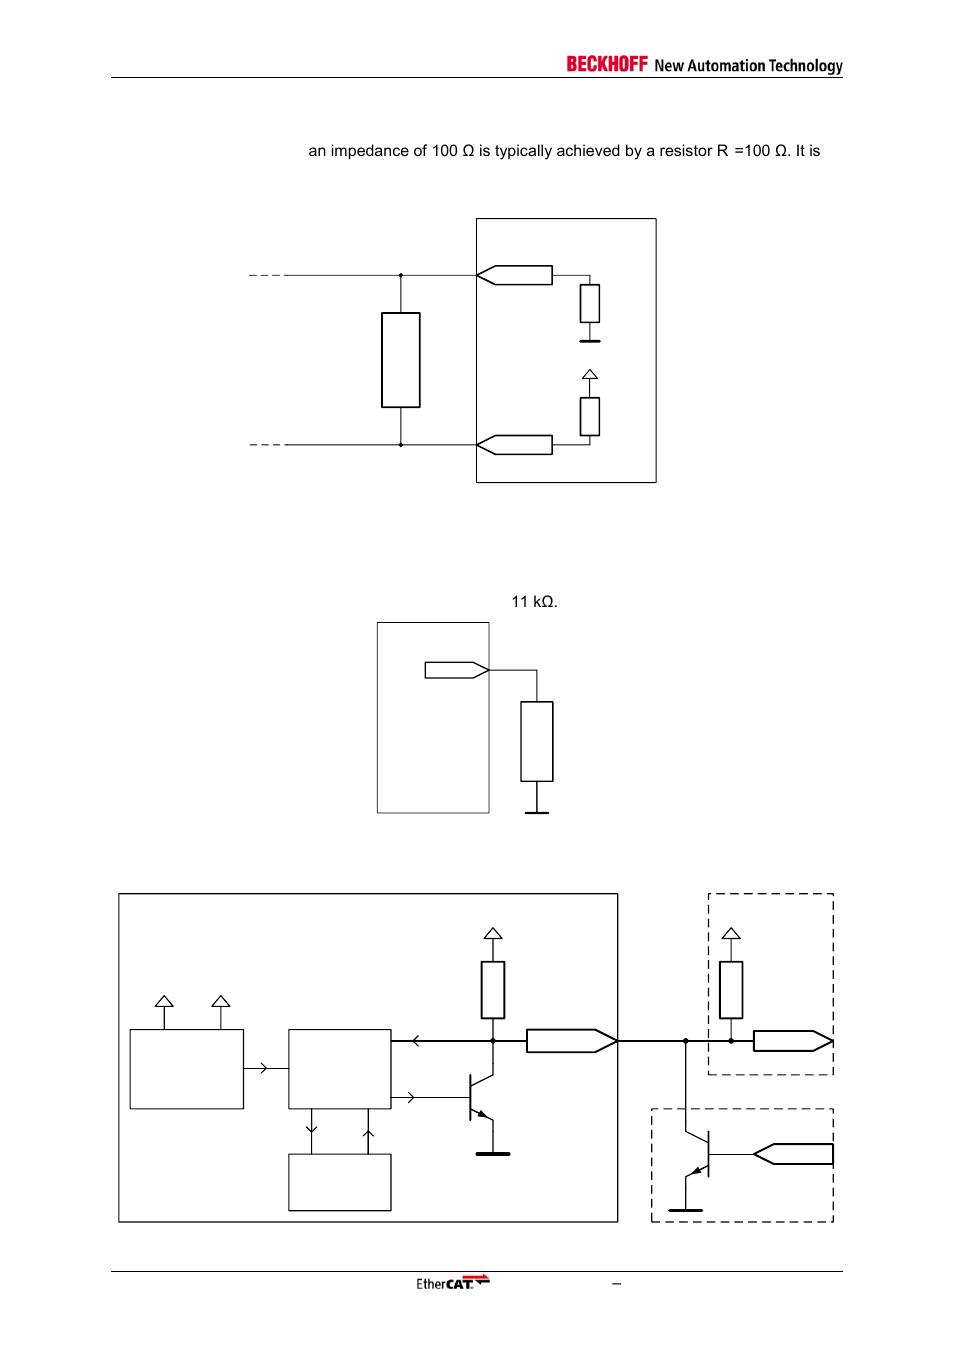 5 lvds termination, 6 rbias resistor, 7 reset logic